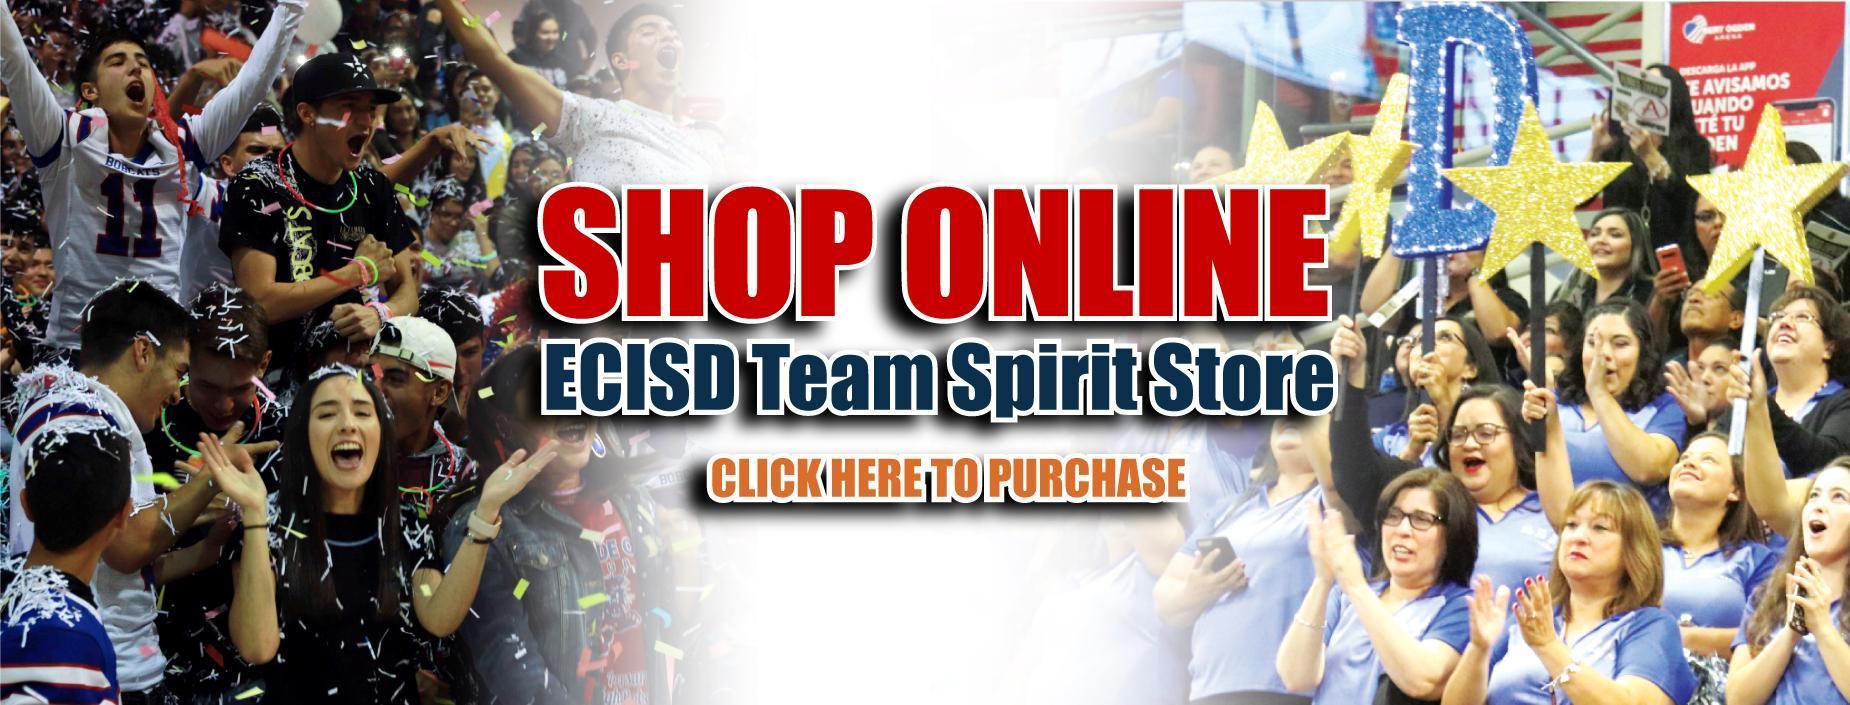 ECISD Team Spirit Online Store